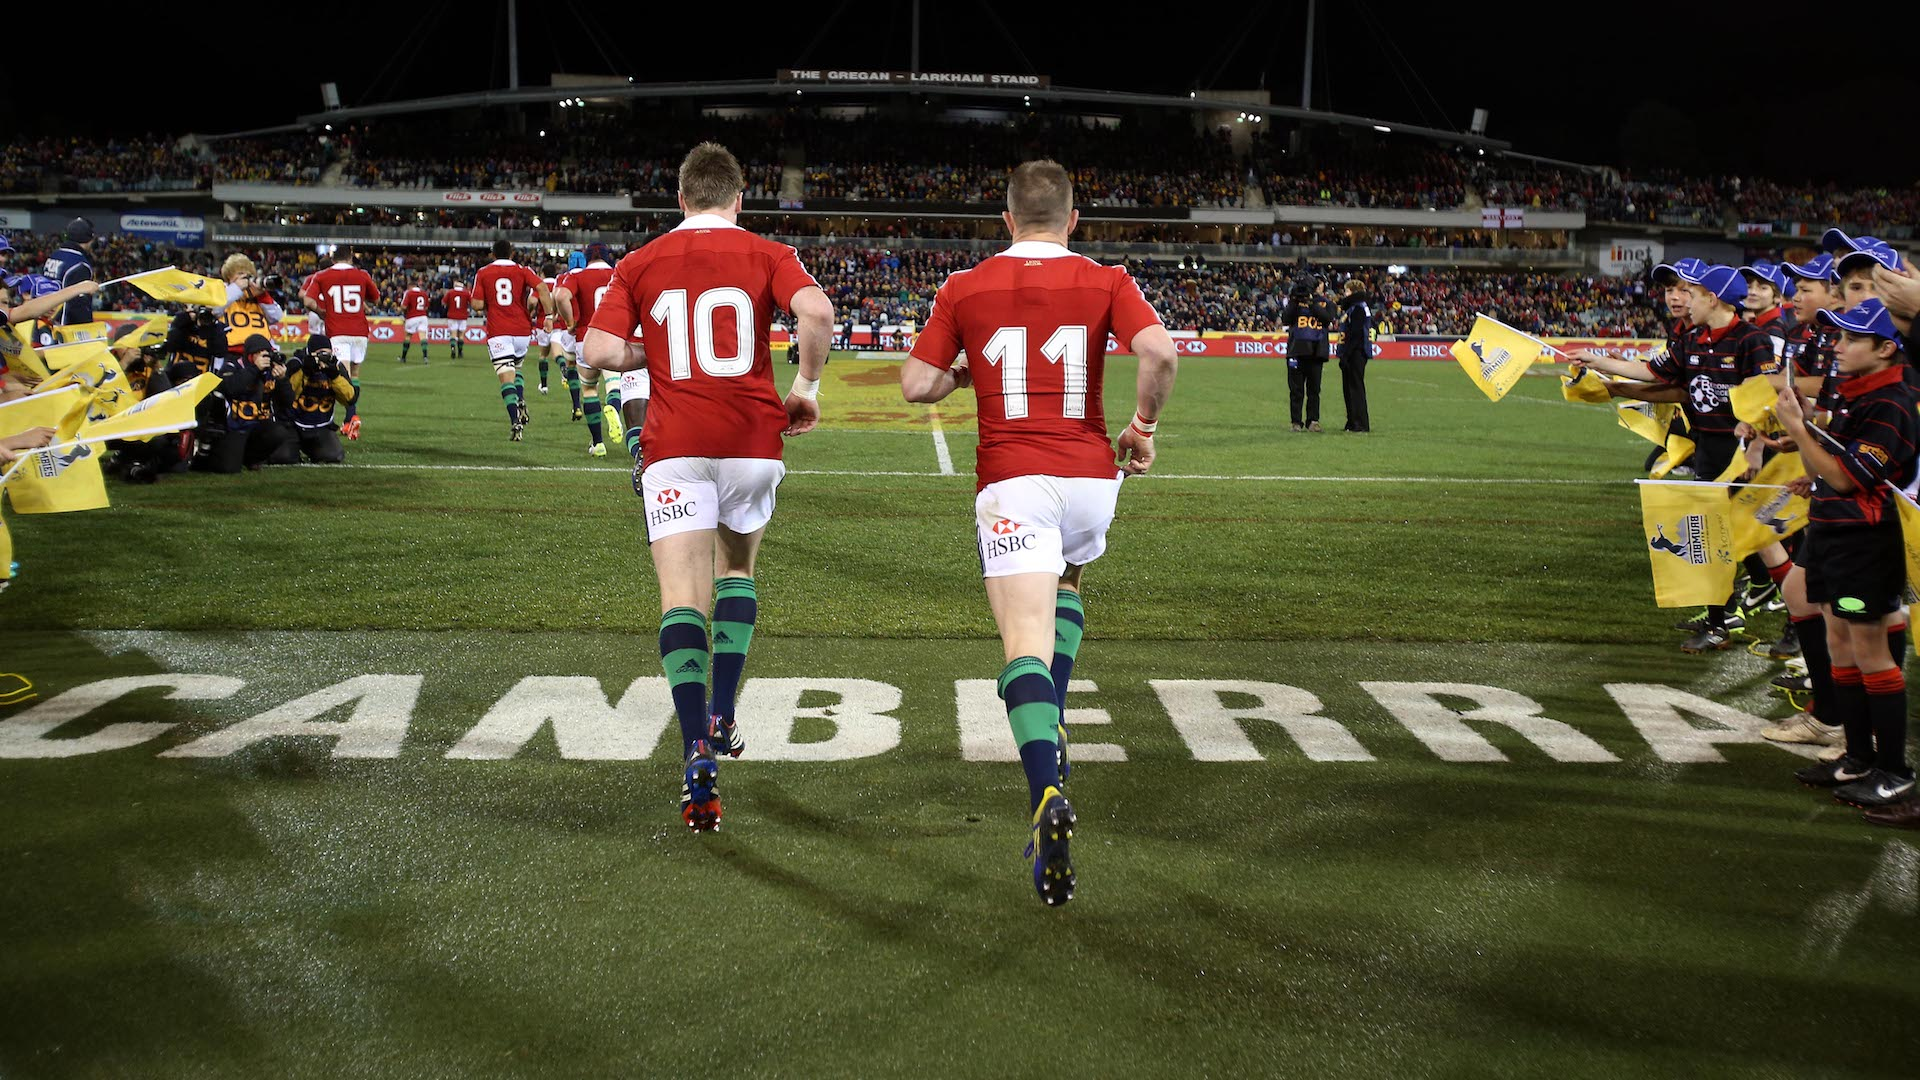 Shane Williams and Stuart Hogg